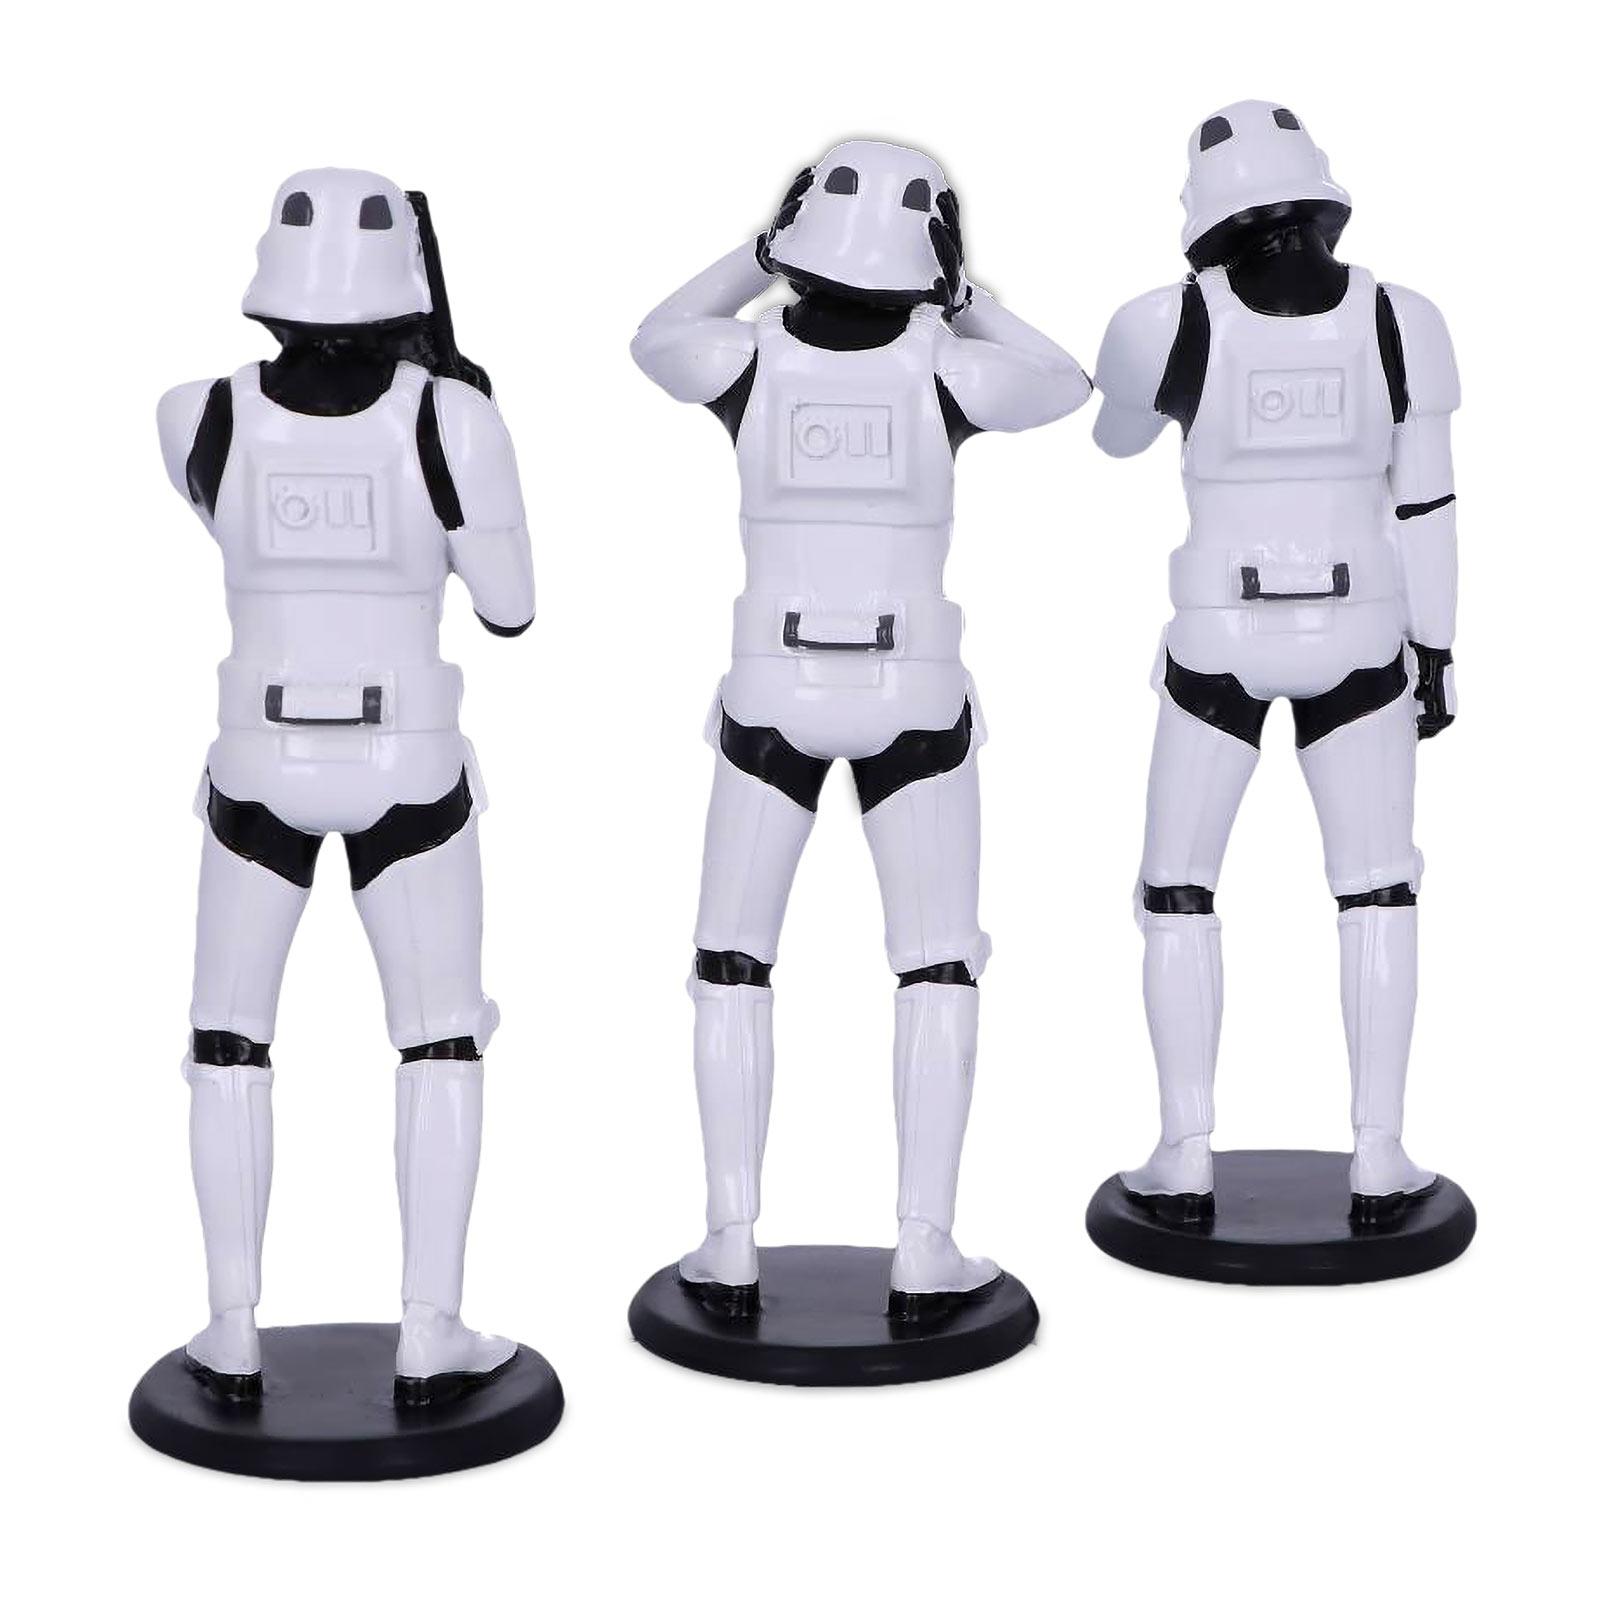 Original Stormtrooper Don't See Hear Speak Figurenset